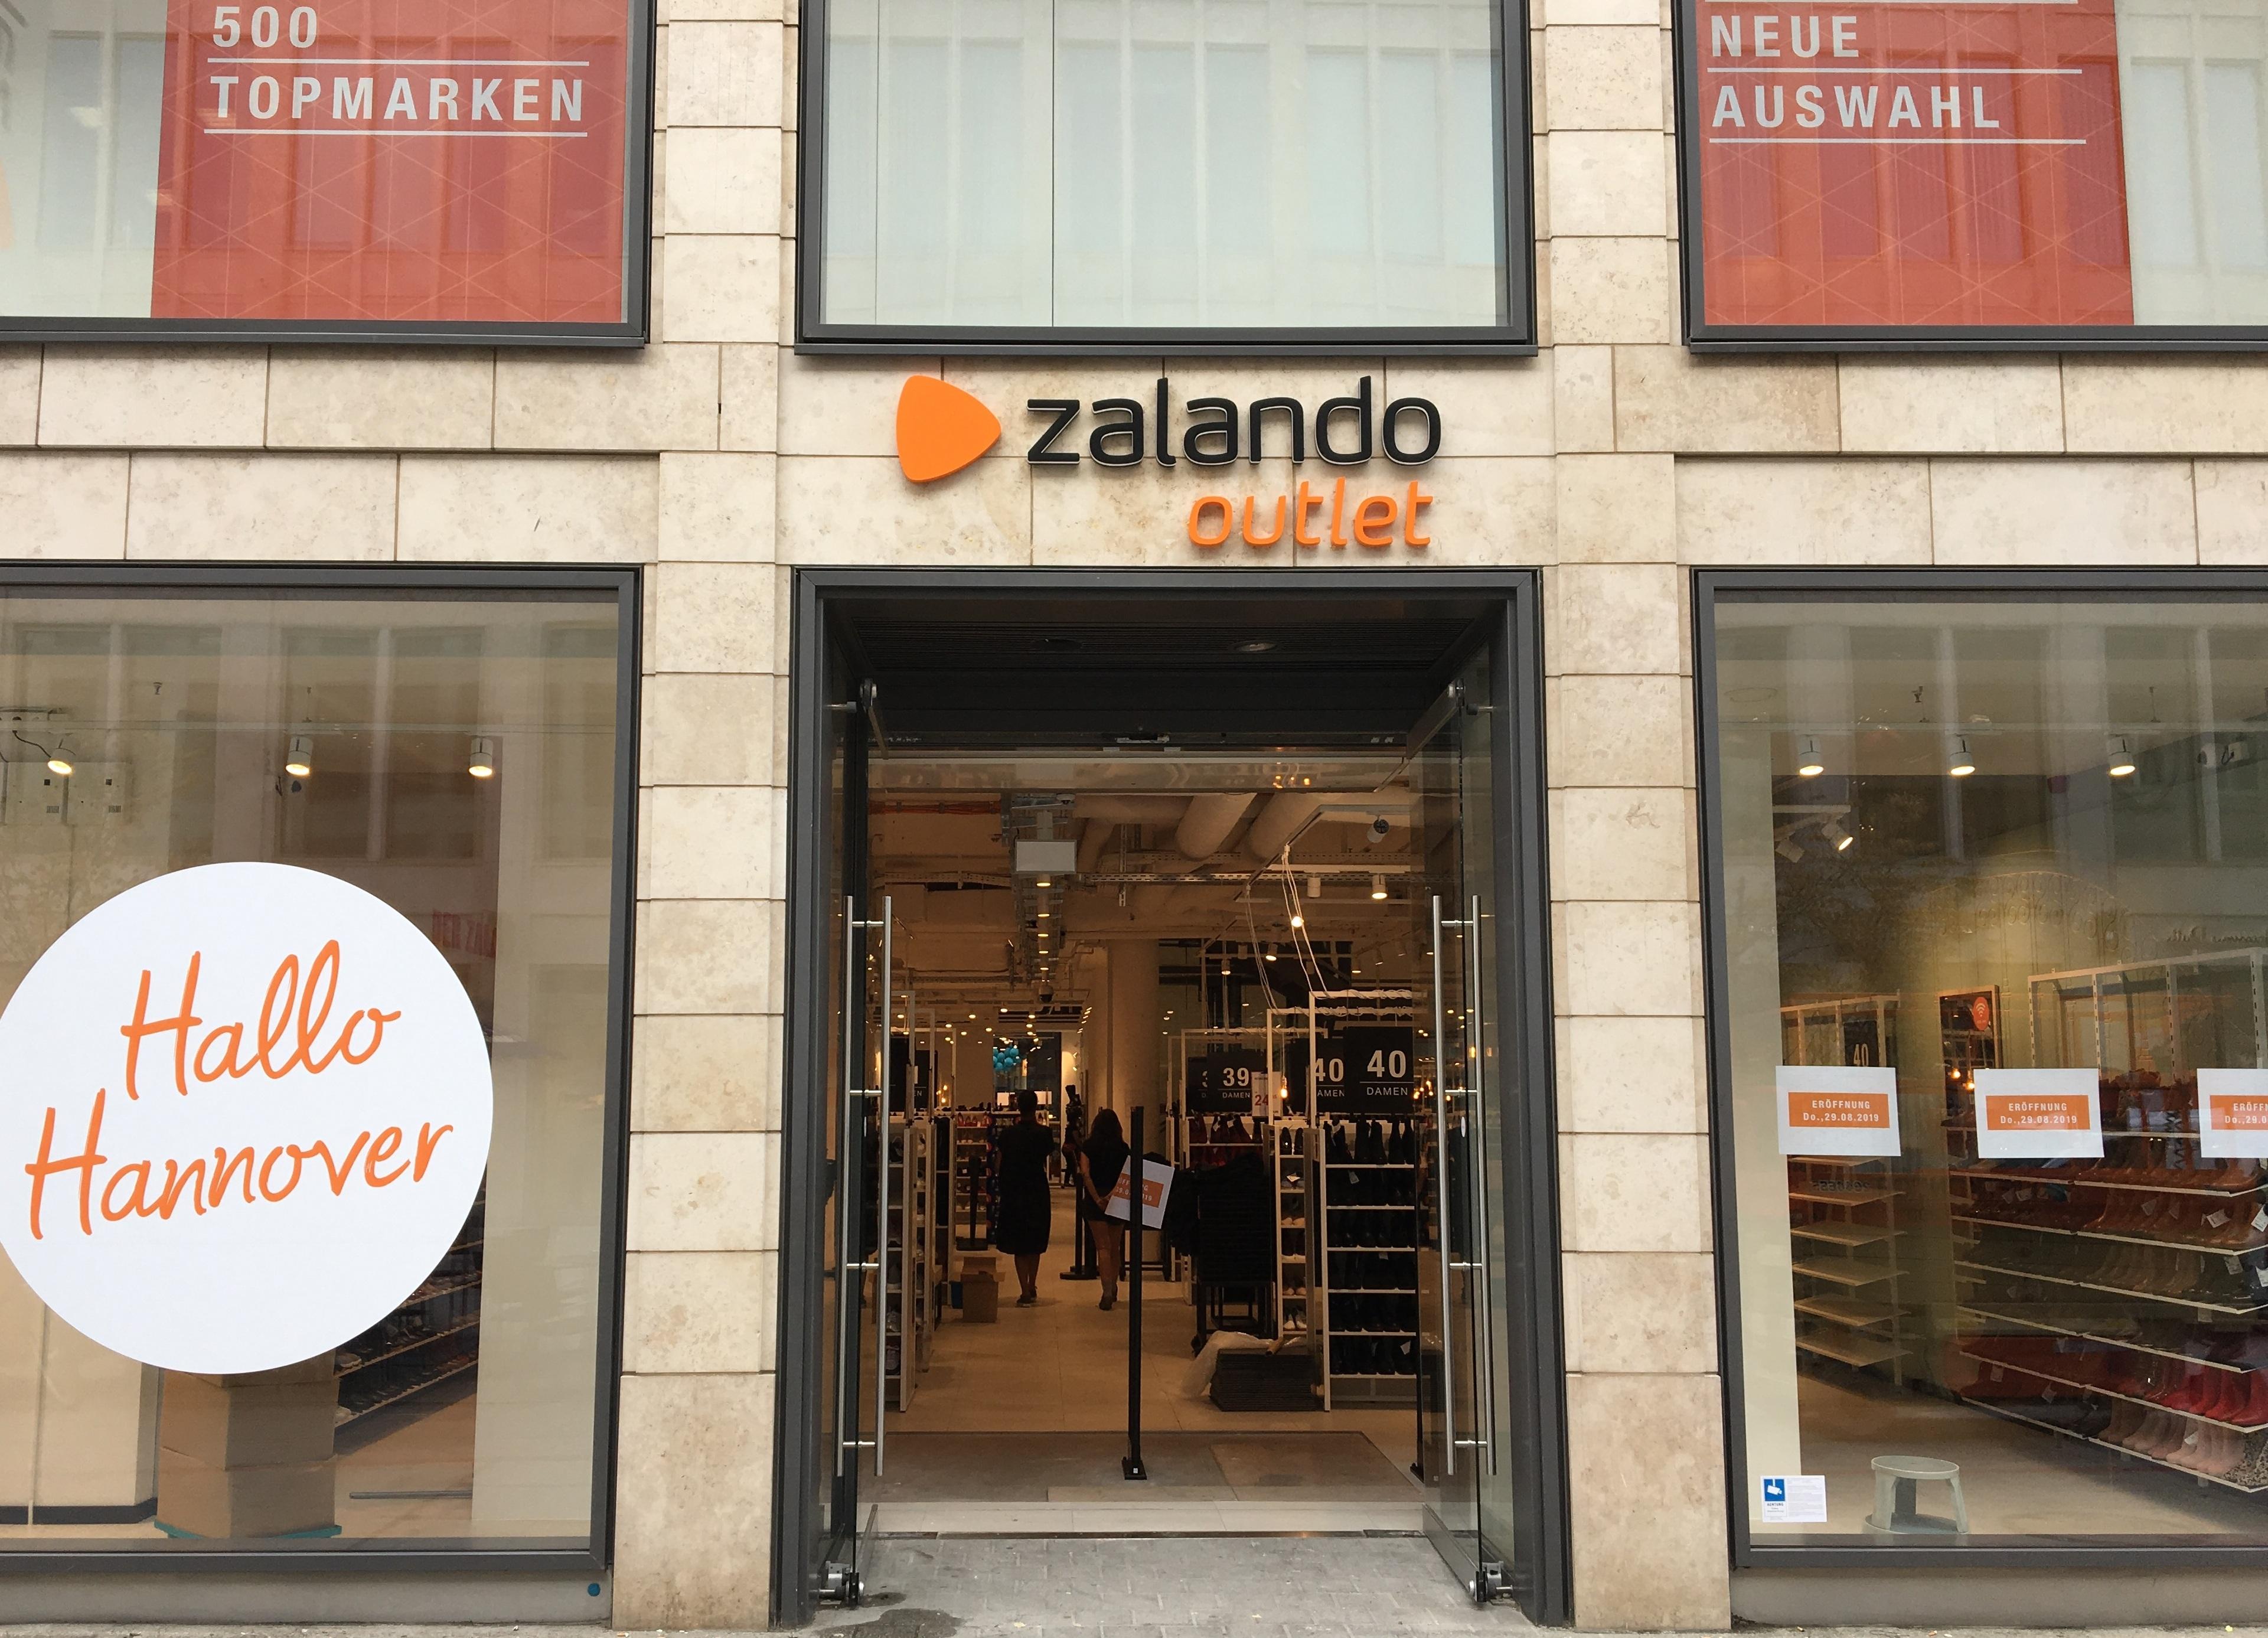 promo code 52214 7f638 Zalando-Outlet eröffnet morgen in Hannover - nw-ihk.de